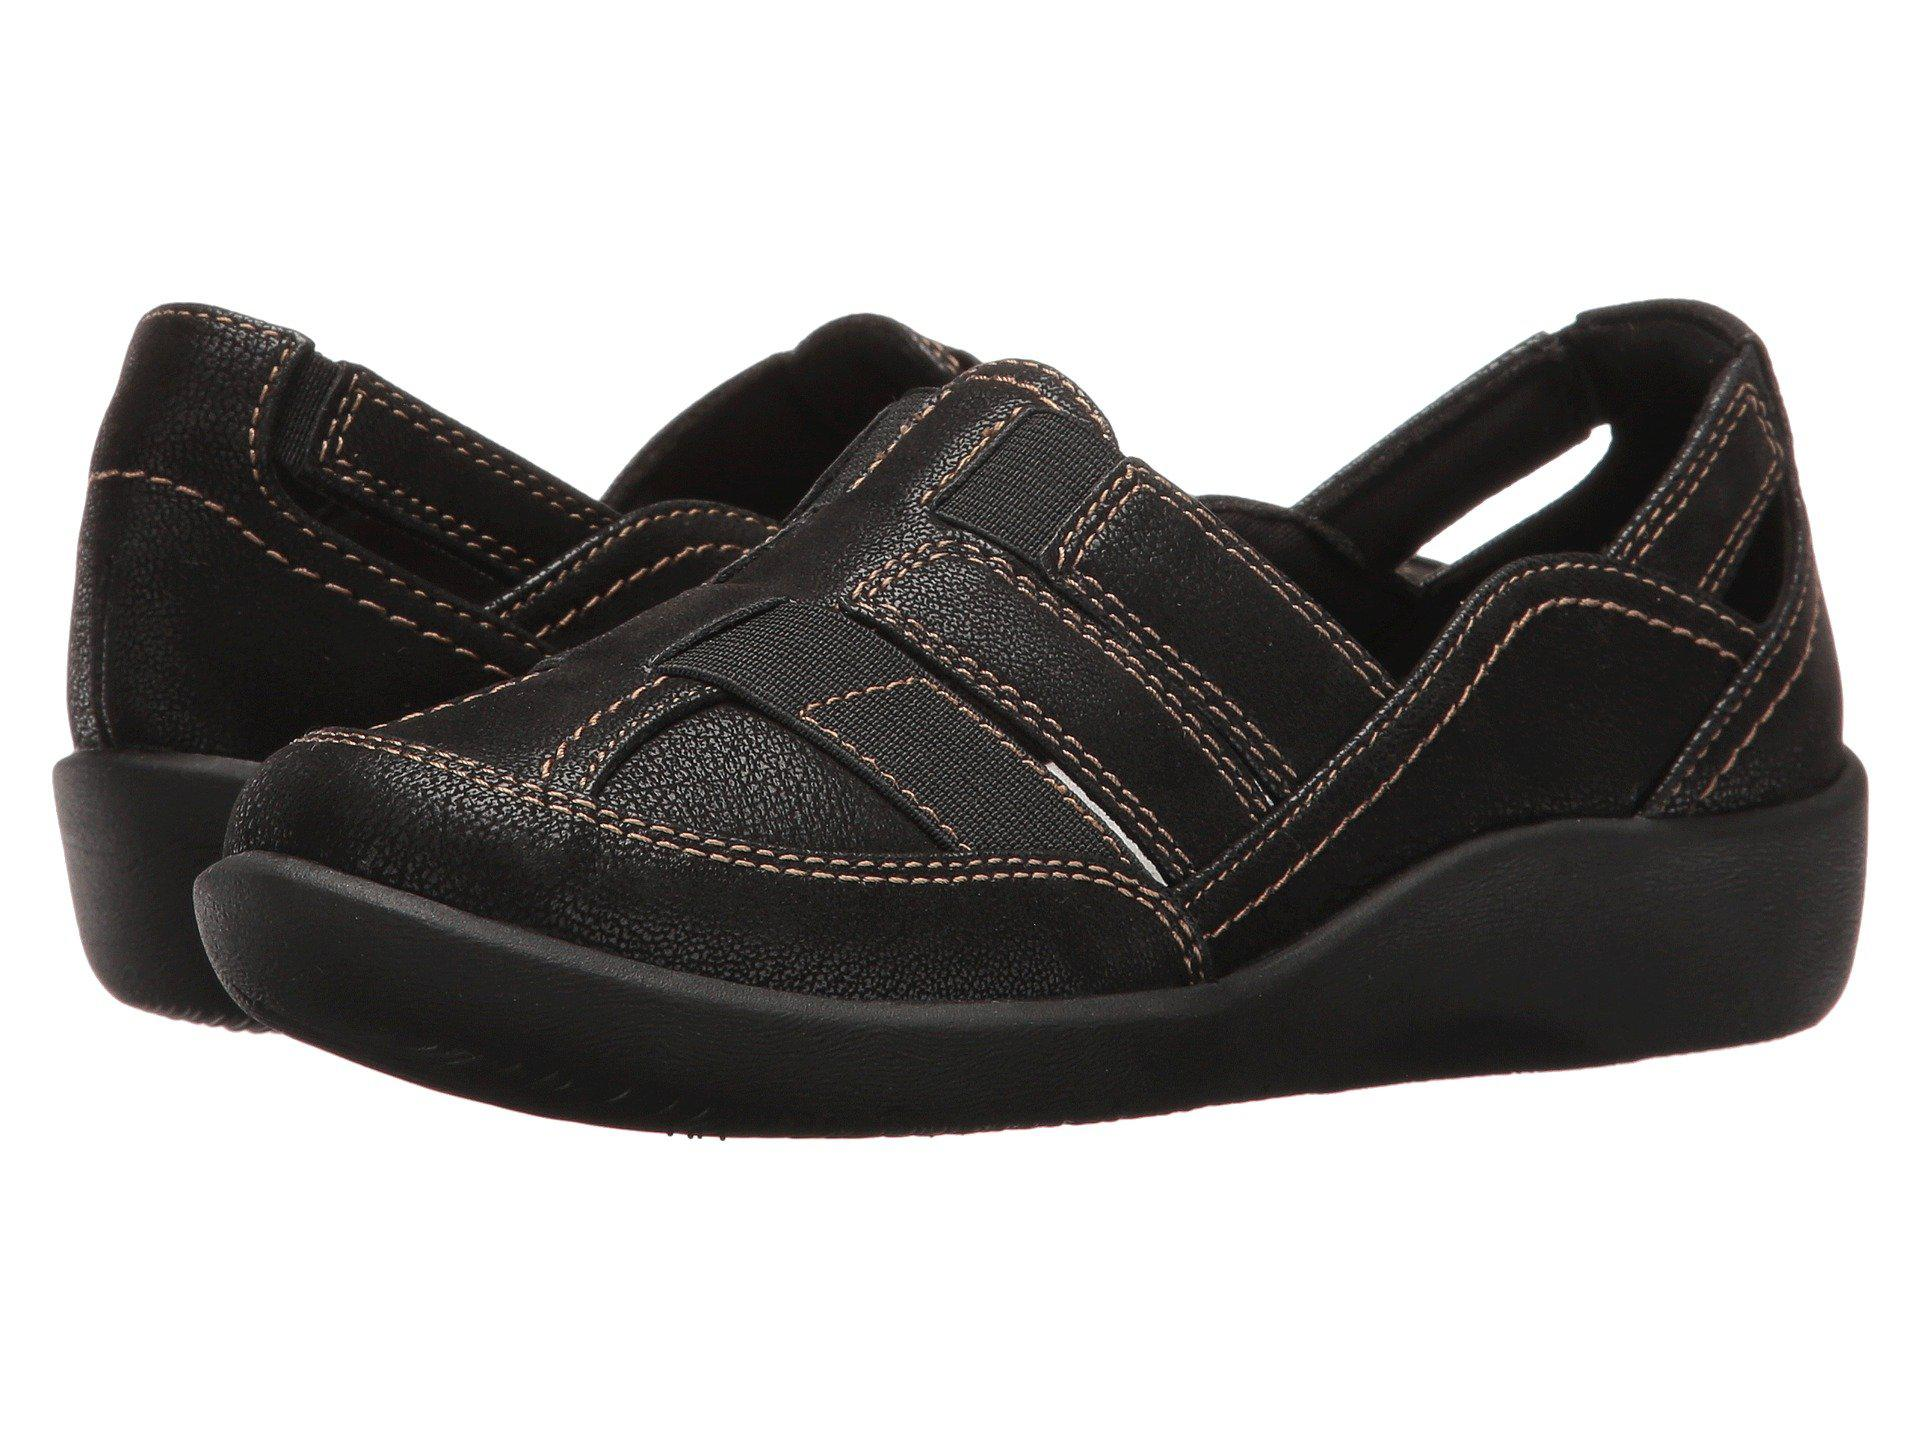 e35de647c2a Lyst - Clarks Sillian Stork (navy) Women s Sandals in Black - Save ...